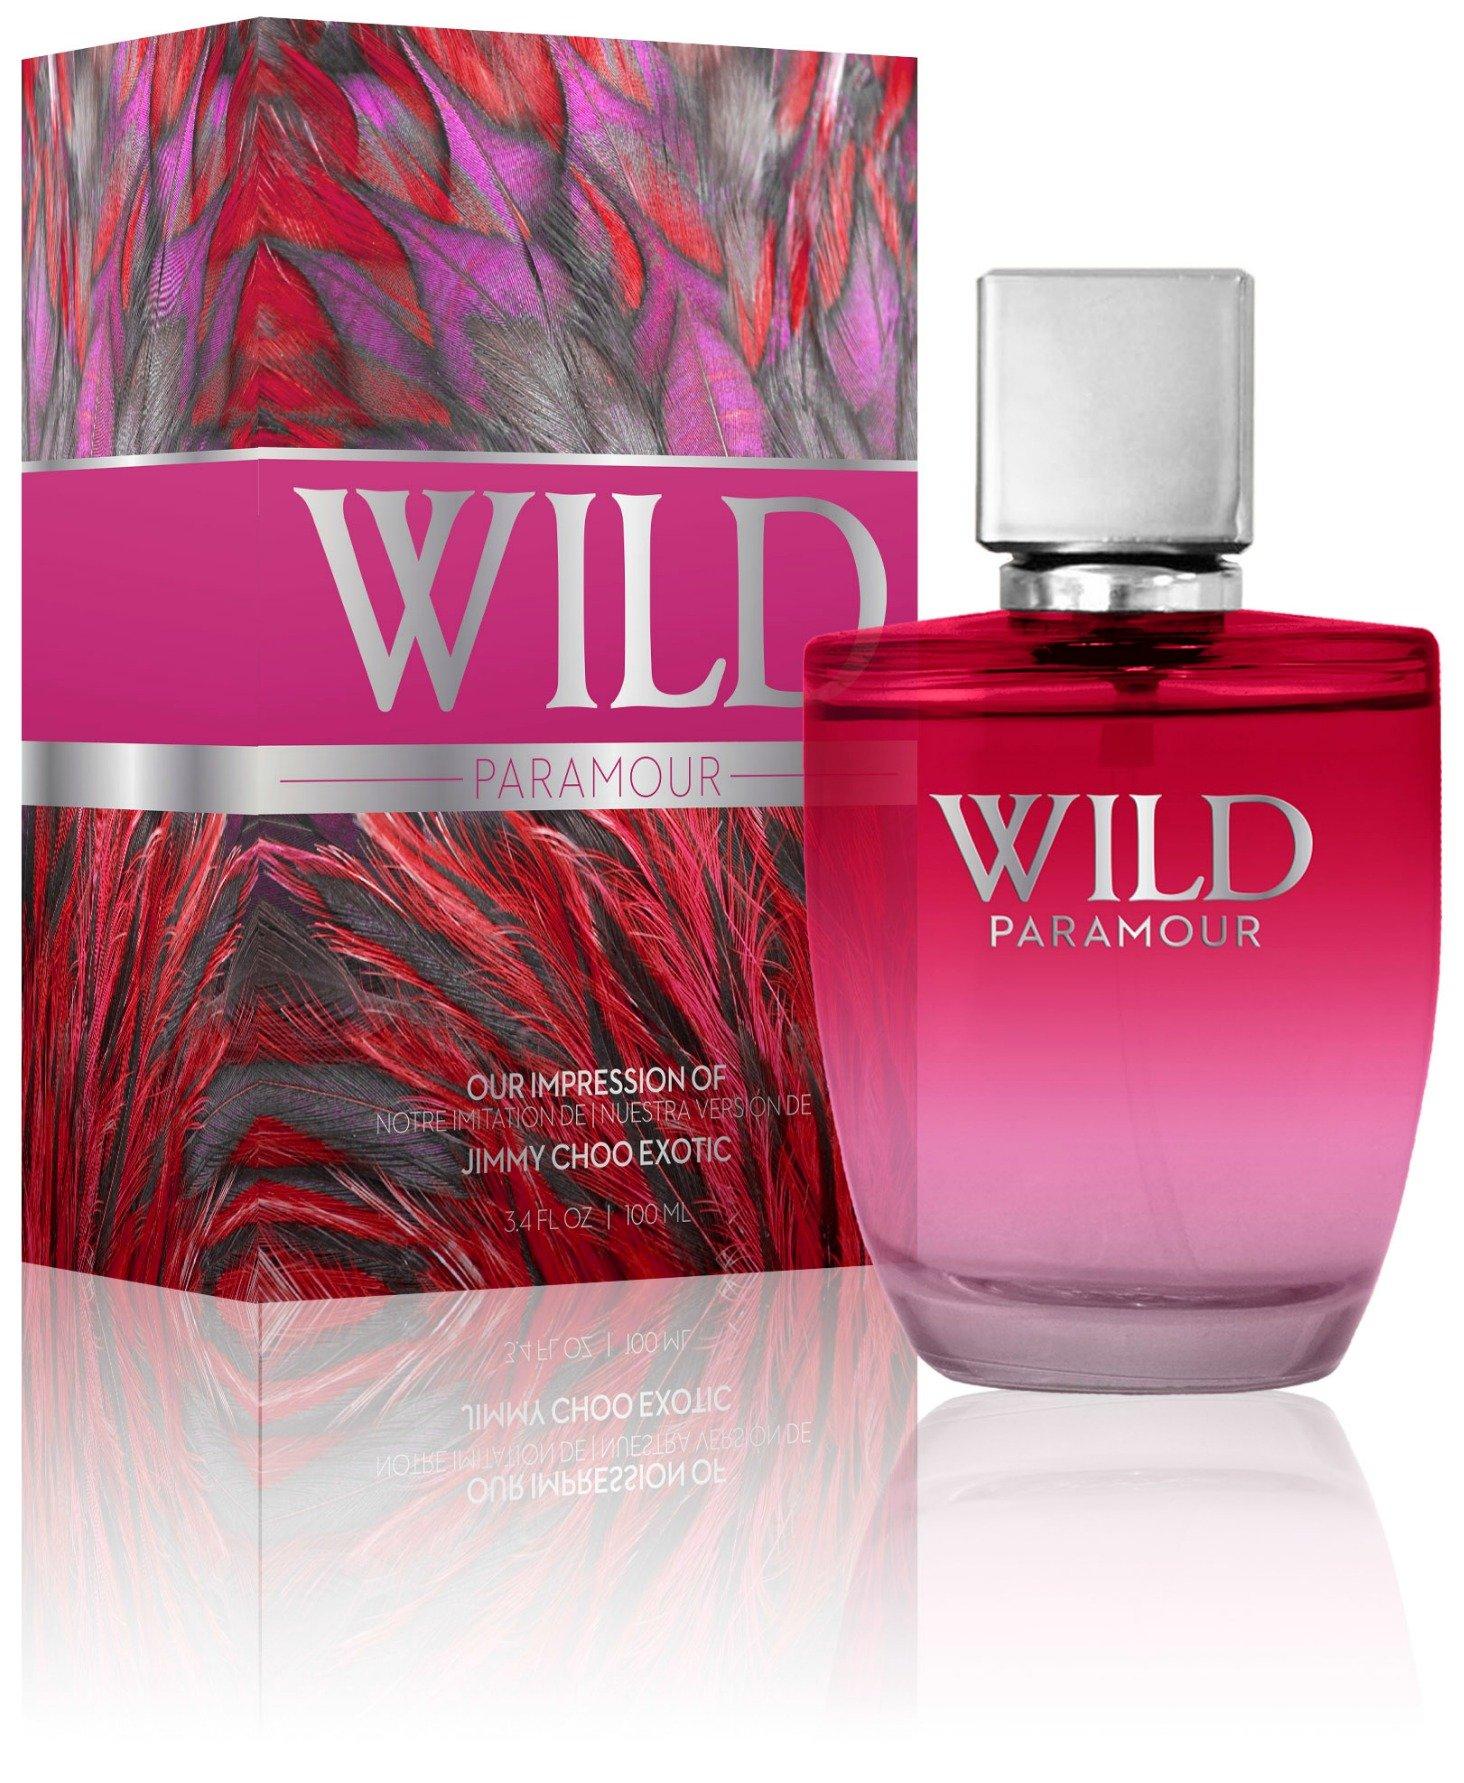 amazon.com - WILD PARAMOUR PERFUME for WOMEN 3.3 fl. oz. (impression of Exotic) by PREFERRED FRAGRANCE